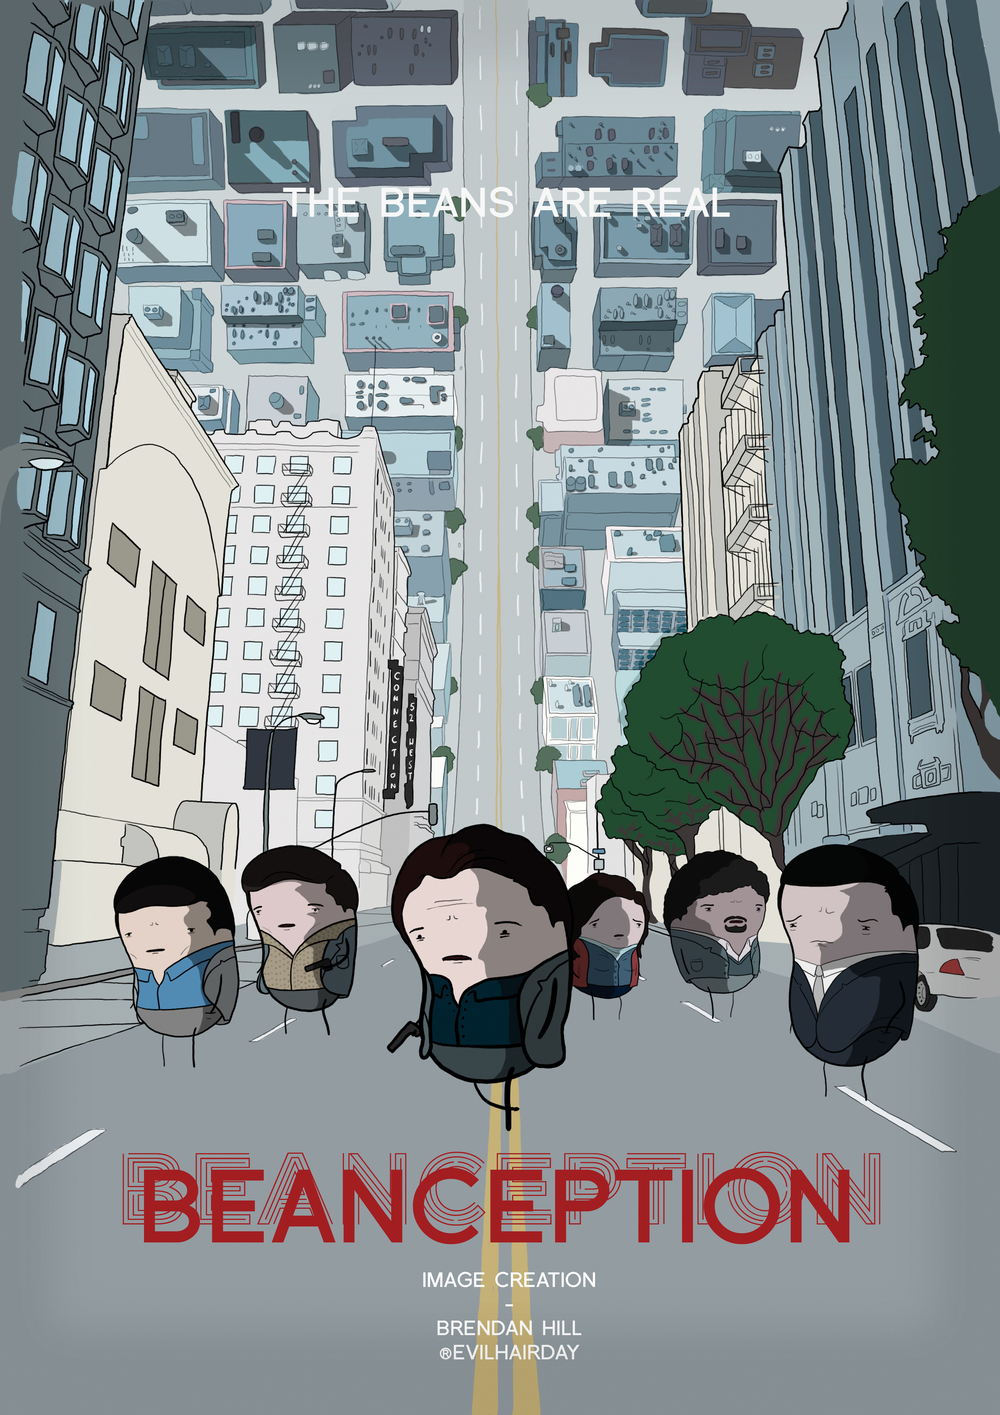 beanception.jpg